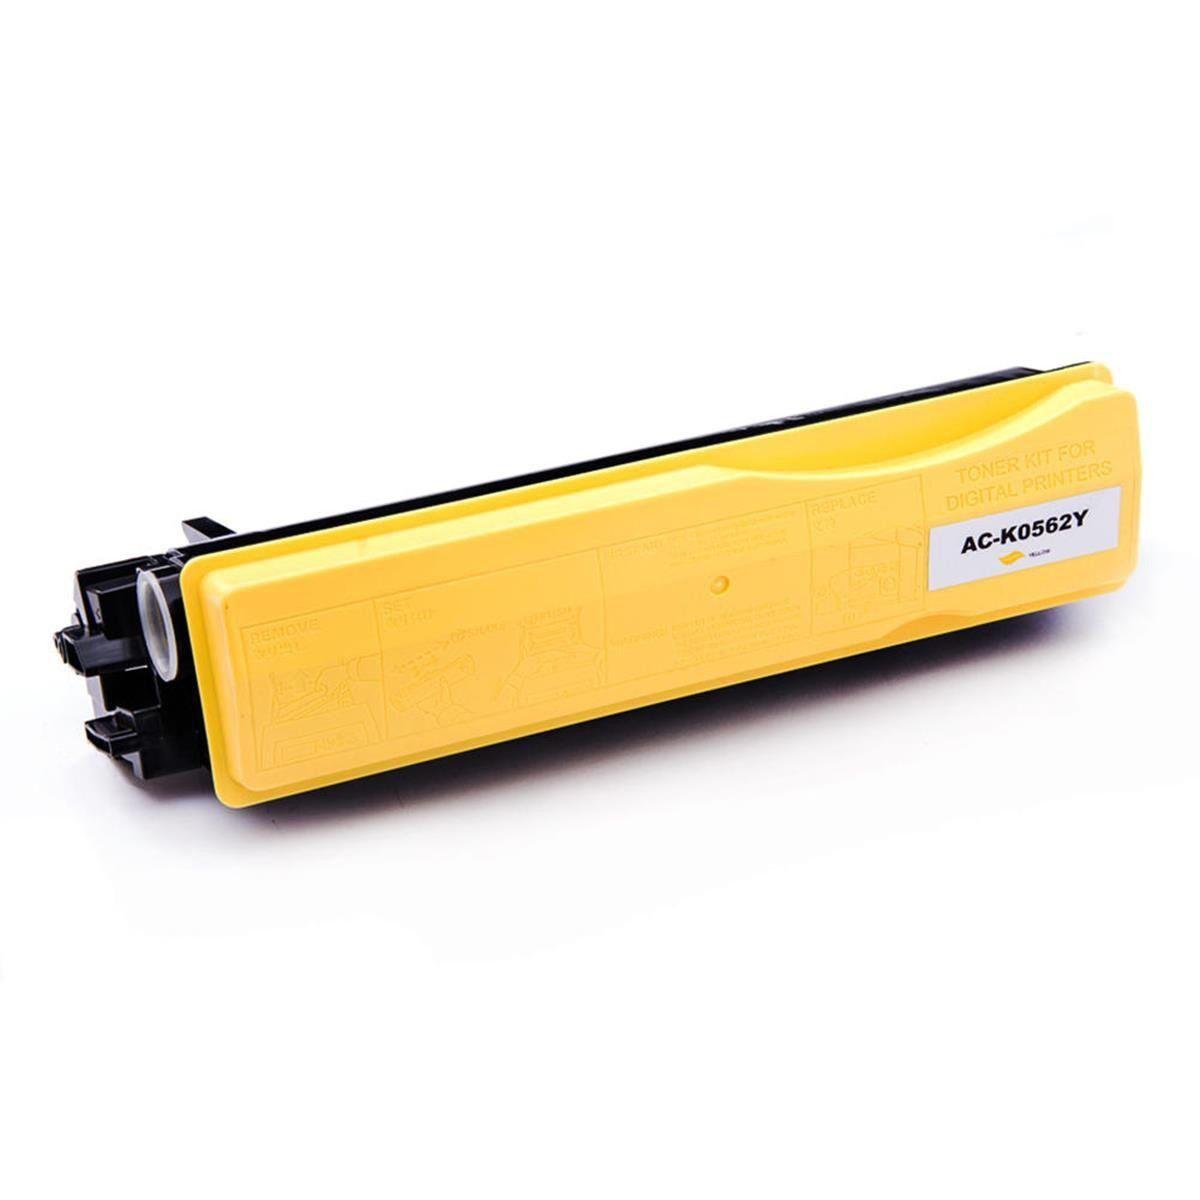 Compatível: Toner TK-562Y TK562 para Kyocera FS-C5300 FS-C5350 FS-C5300dn FS-C5350dn FSC5300 FSC5350 / Amarelo / 10.000